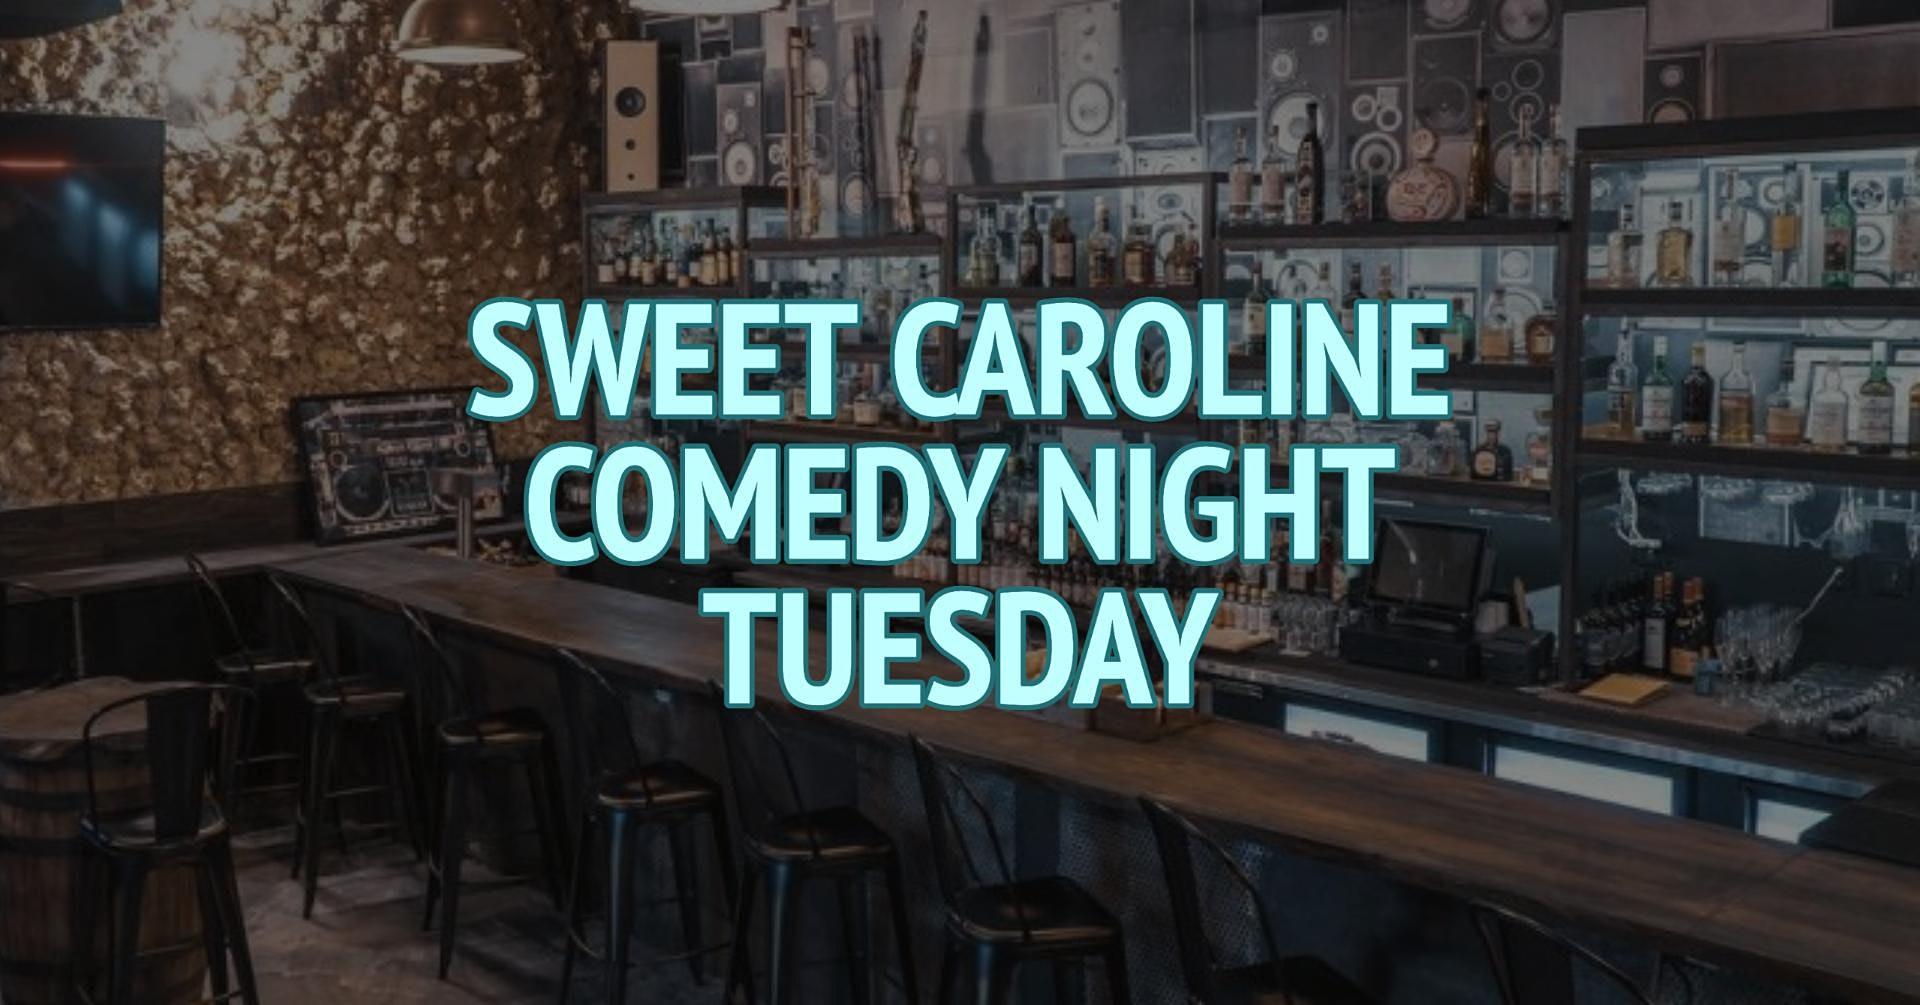 Sweet Caroline Comedy Night